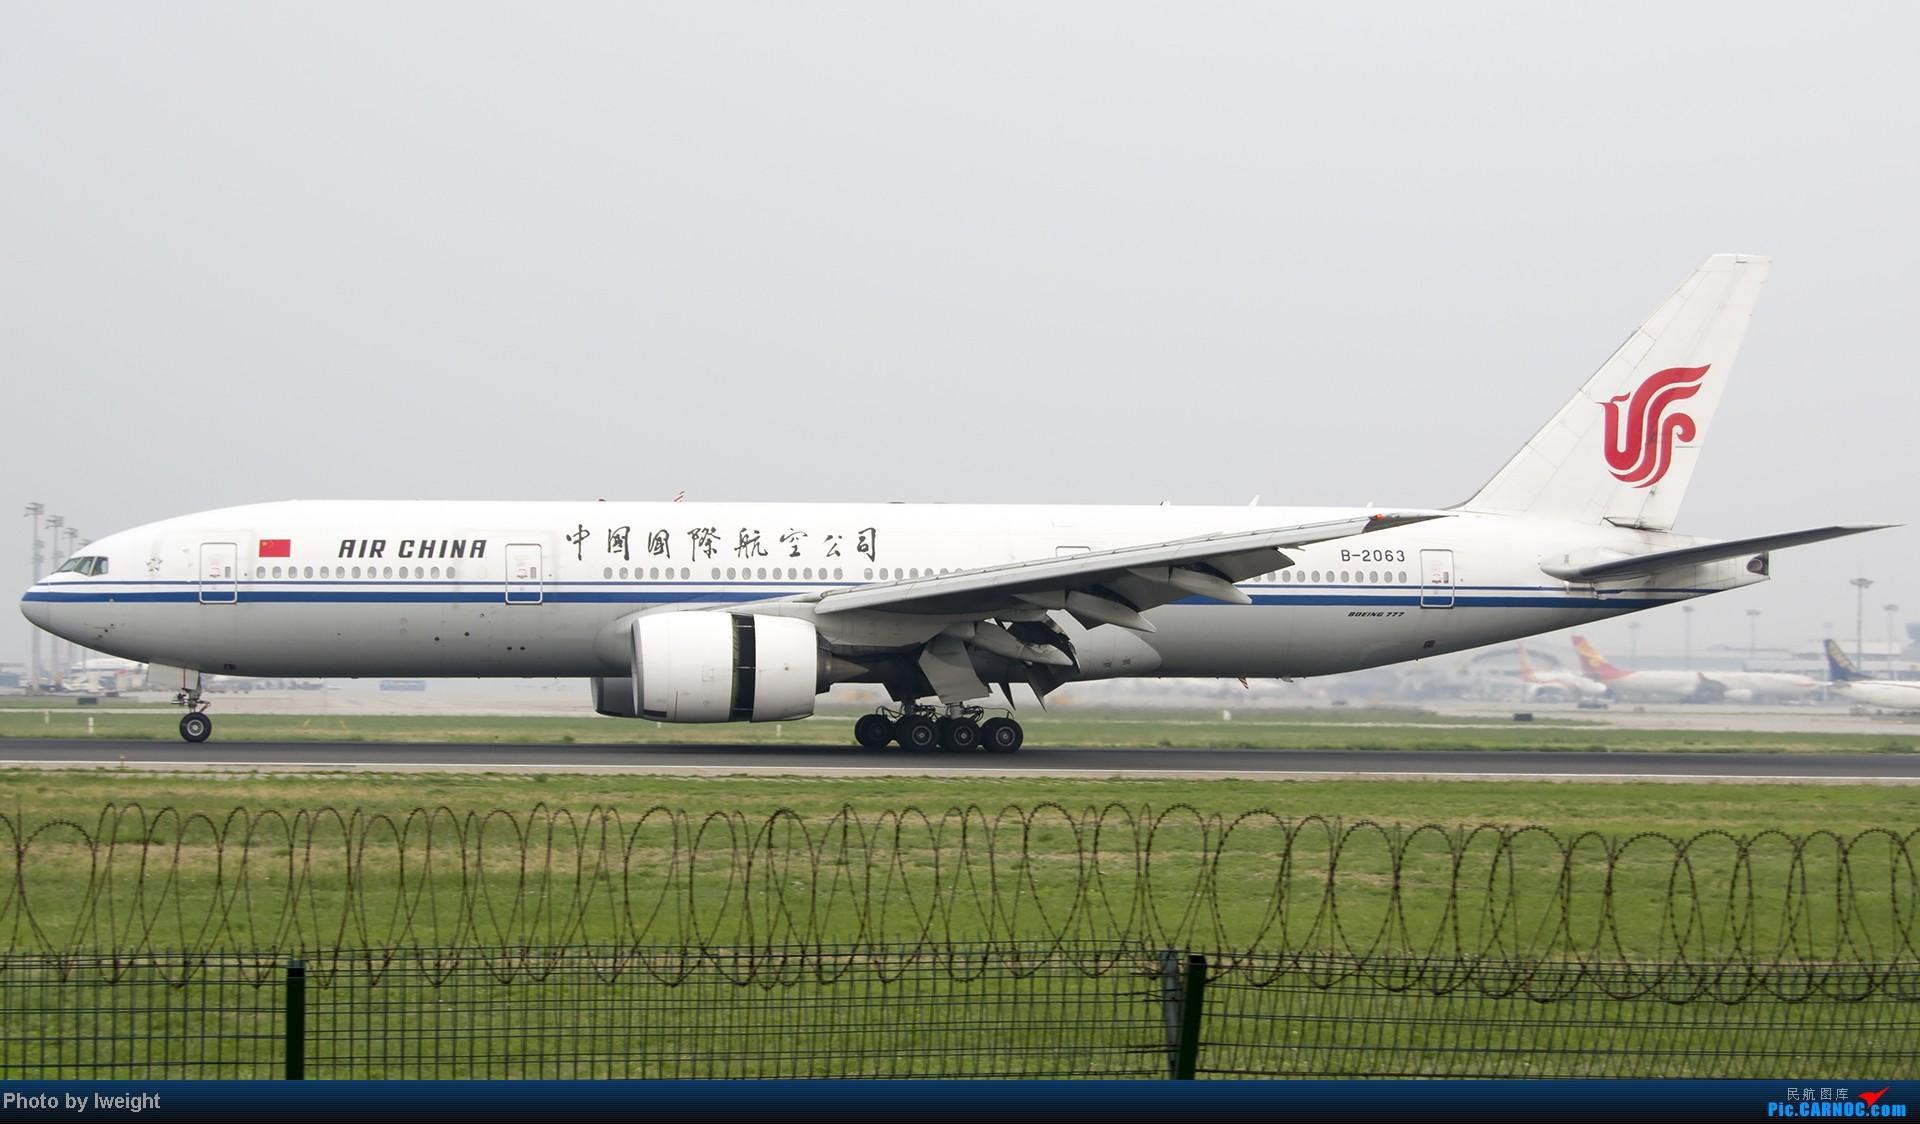 Re:[原创]休假无聊,跑道边来拍机玩(晚点的ZestAir、换装的B6100和刚交付的B2738等) BOEING 777-200 B-2063 中国北京首都机场